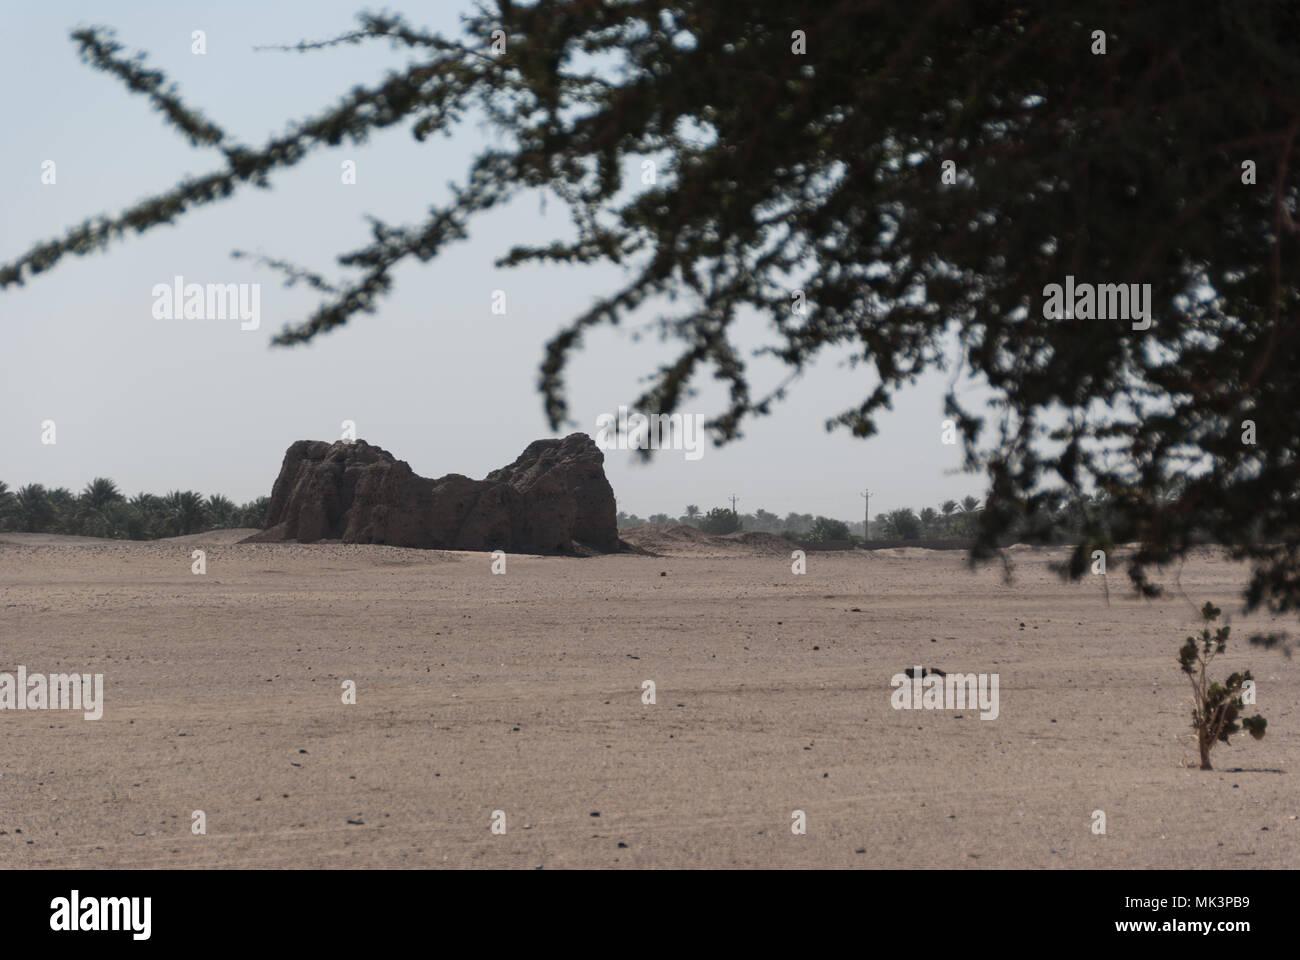 Eastern Deffufa near Kerma, Sudan - Stock Image